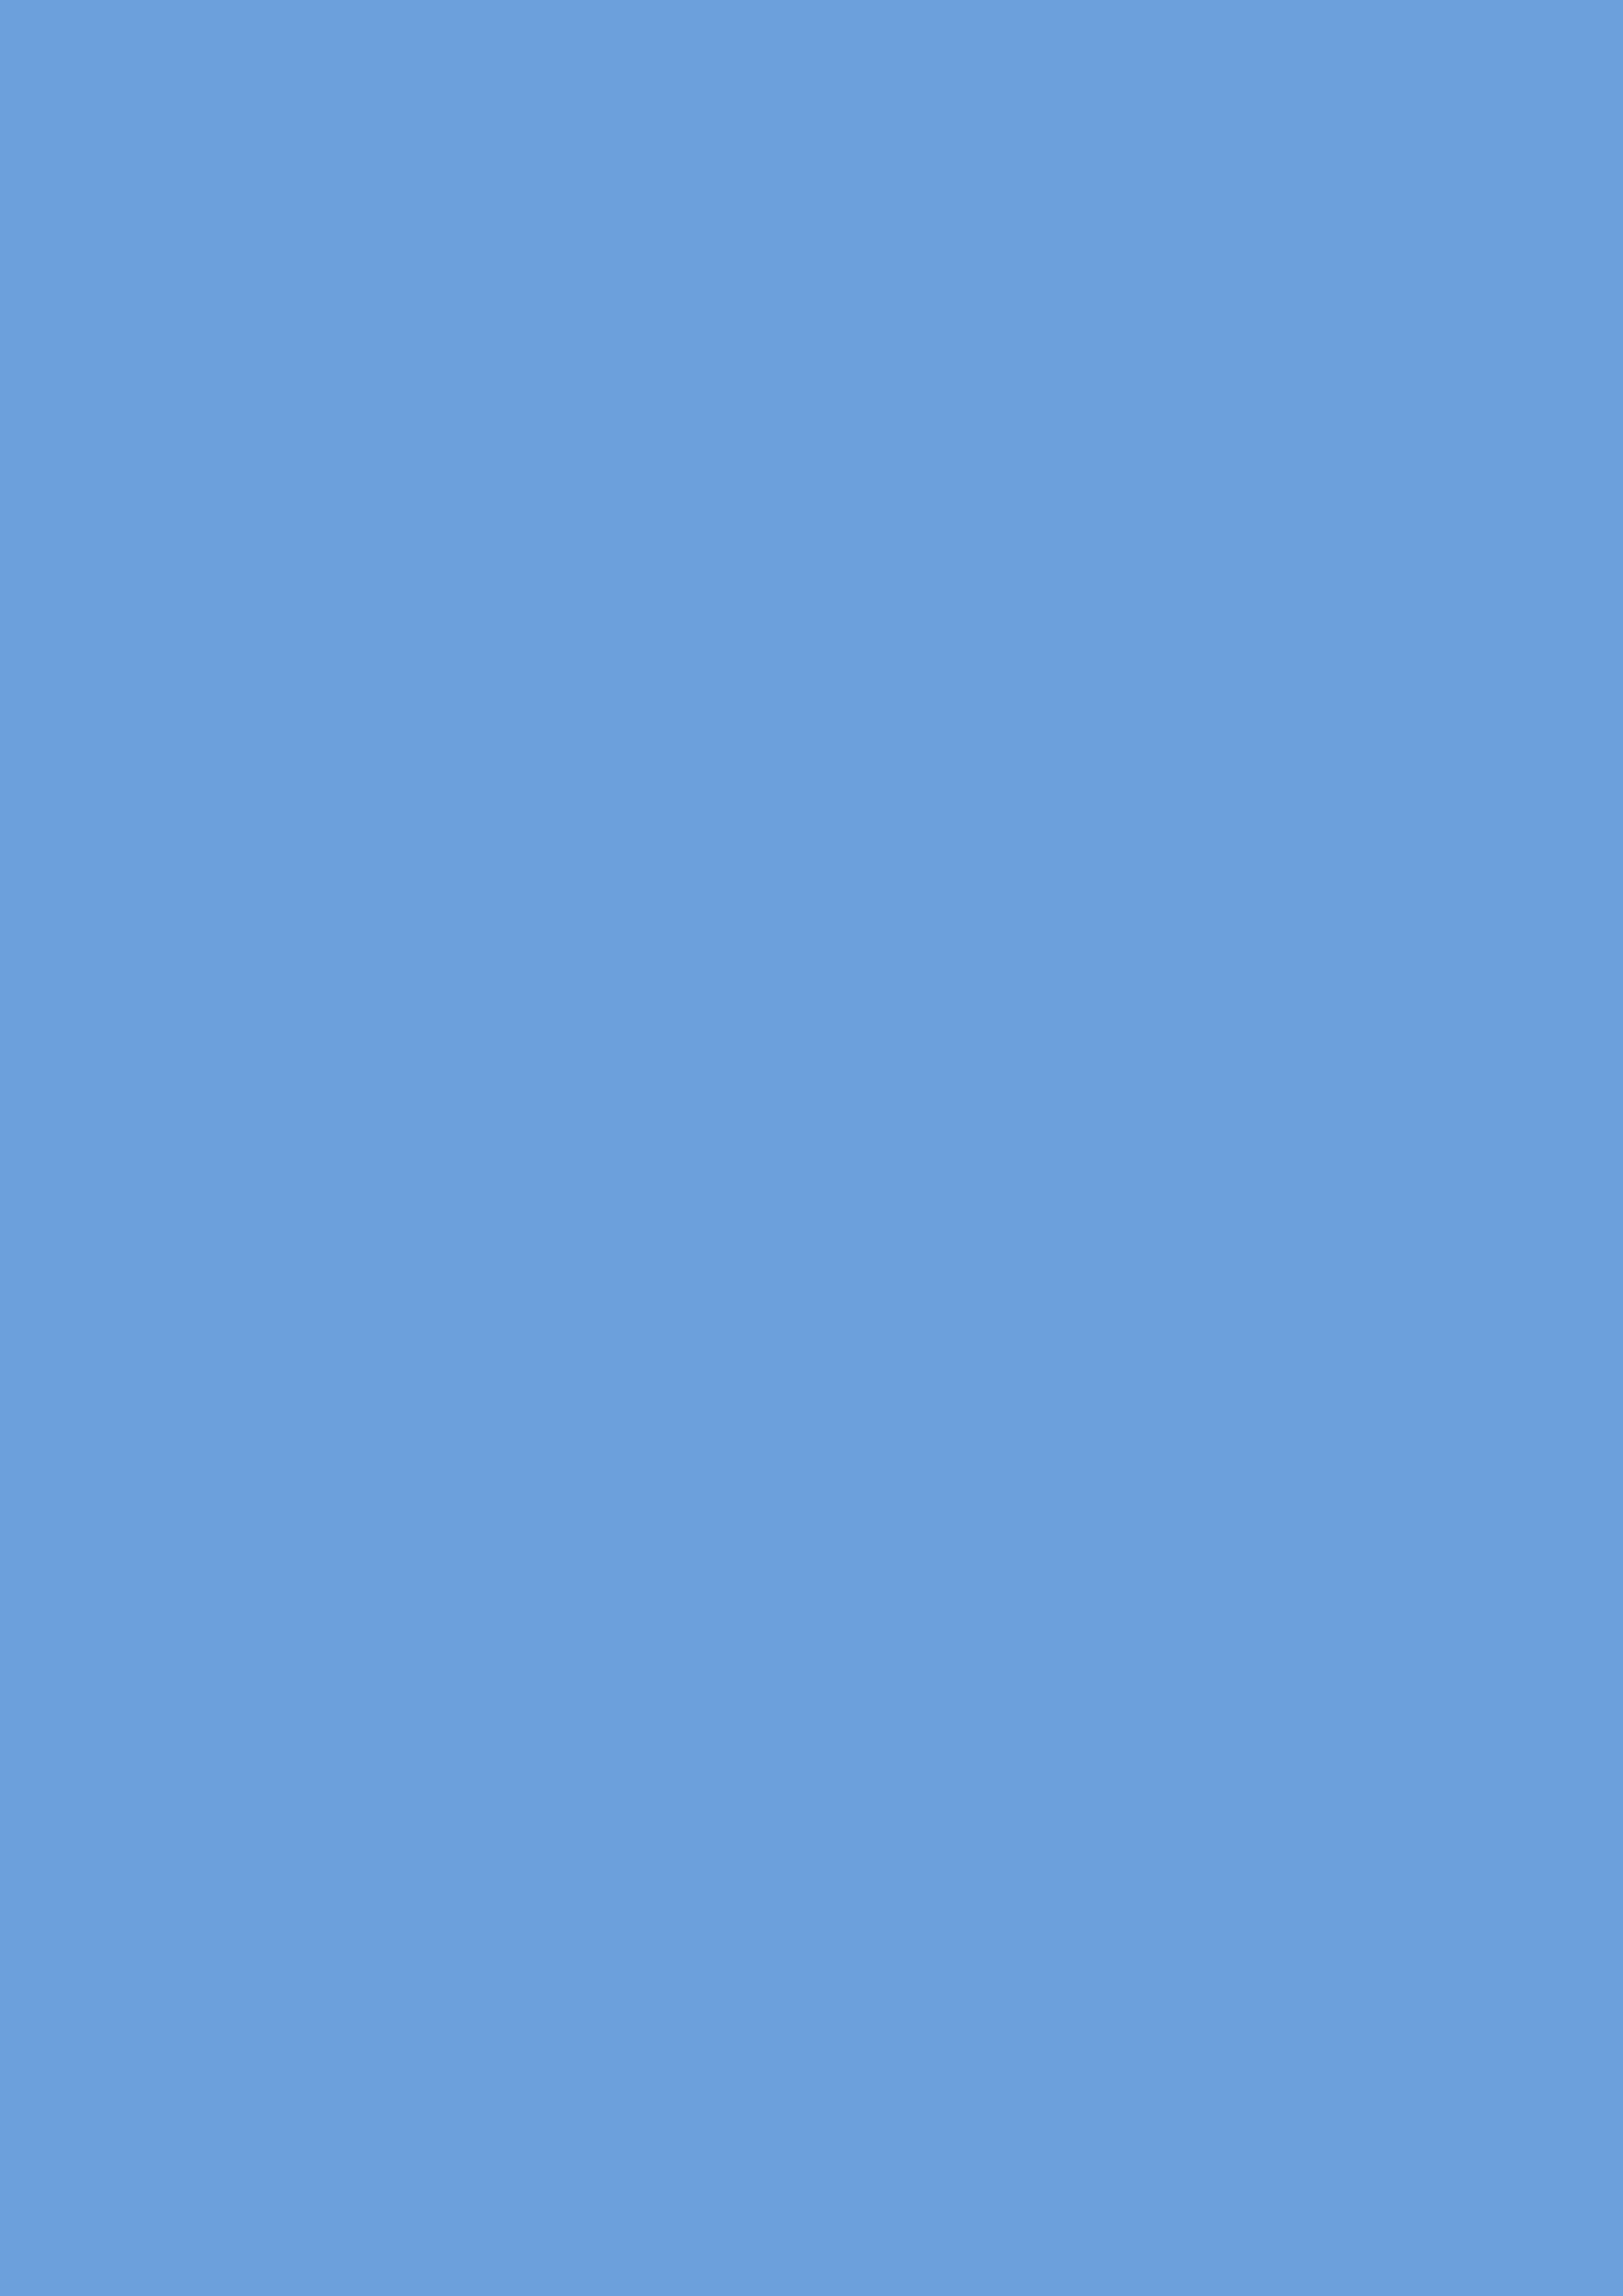 2480x3508 Little Boy Blue Solid Color Background